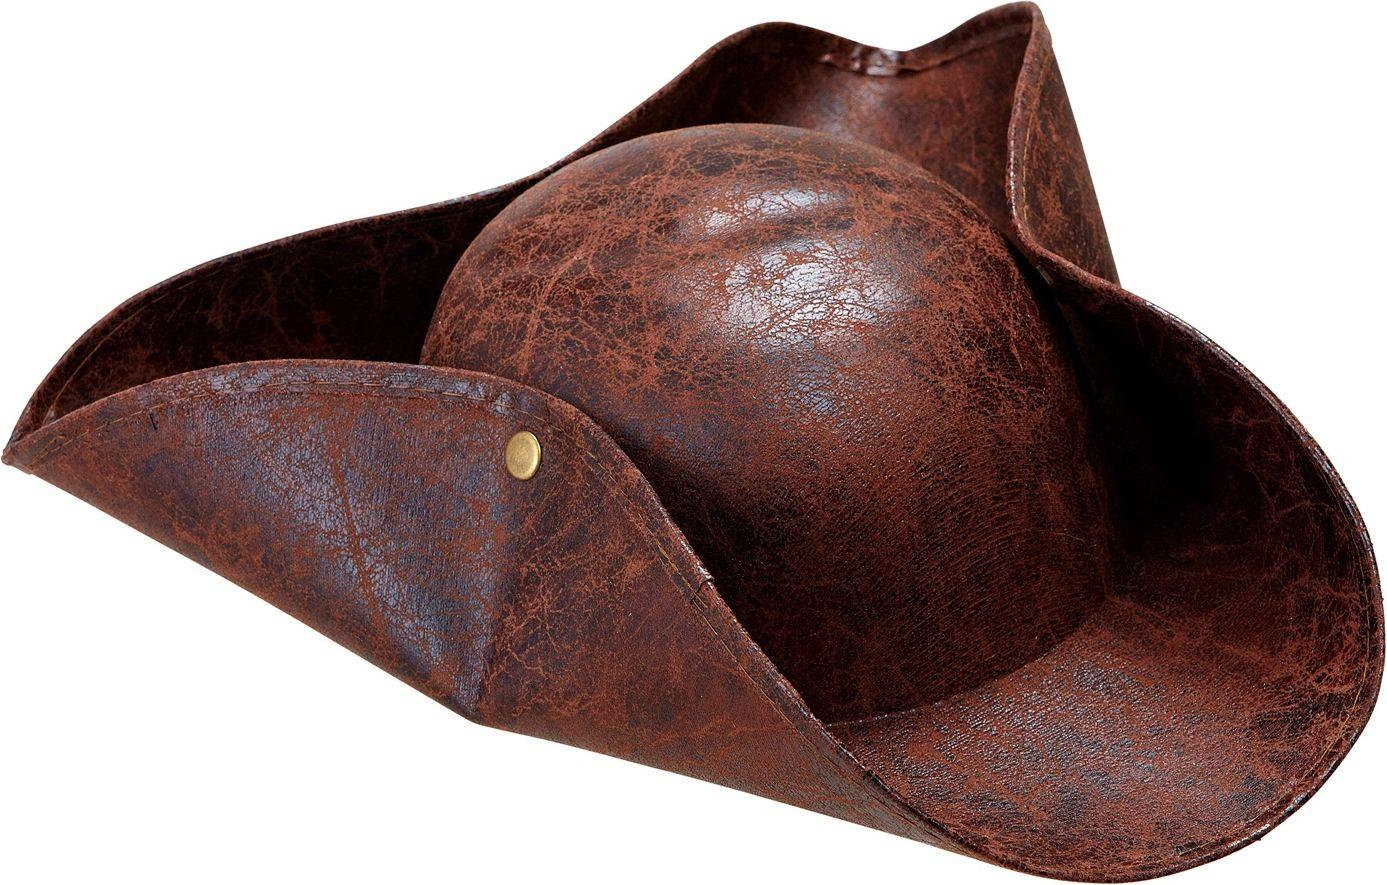 Piraten lederlook tricorn hoed